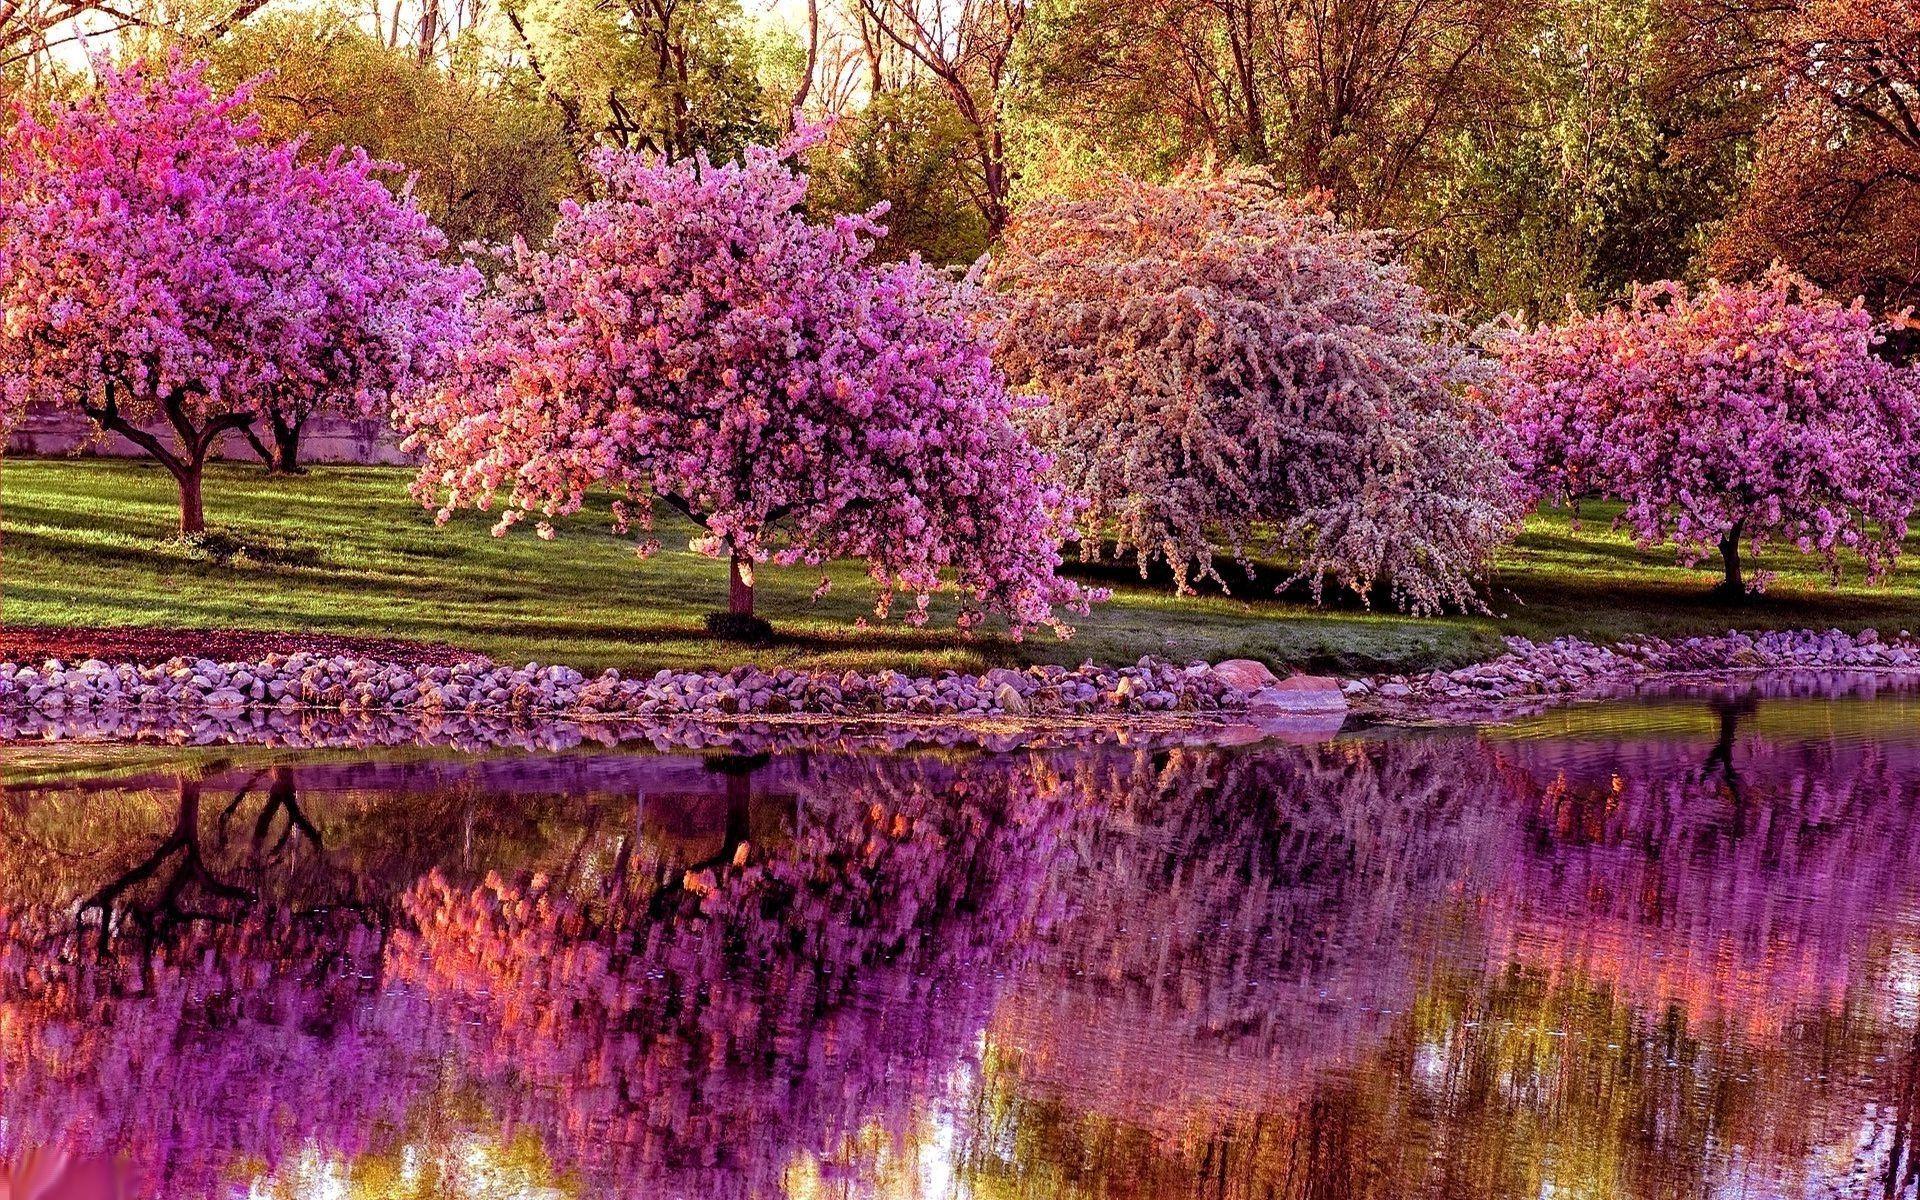 Spring Flower Gardens Wallpaper - WallpaperSafari